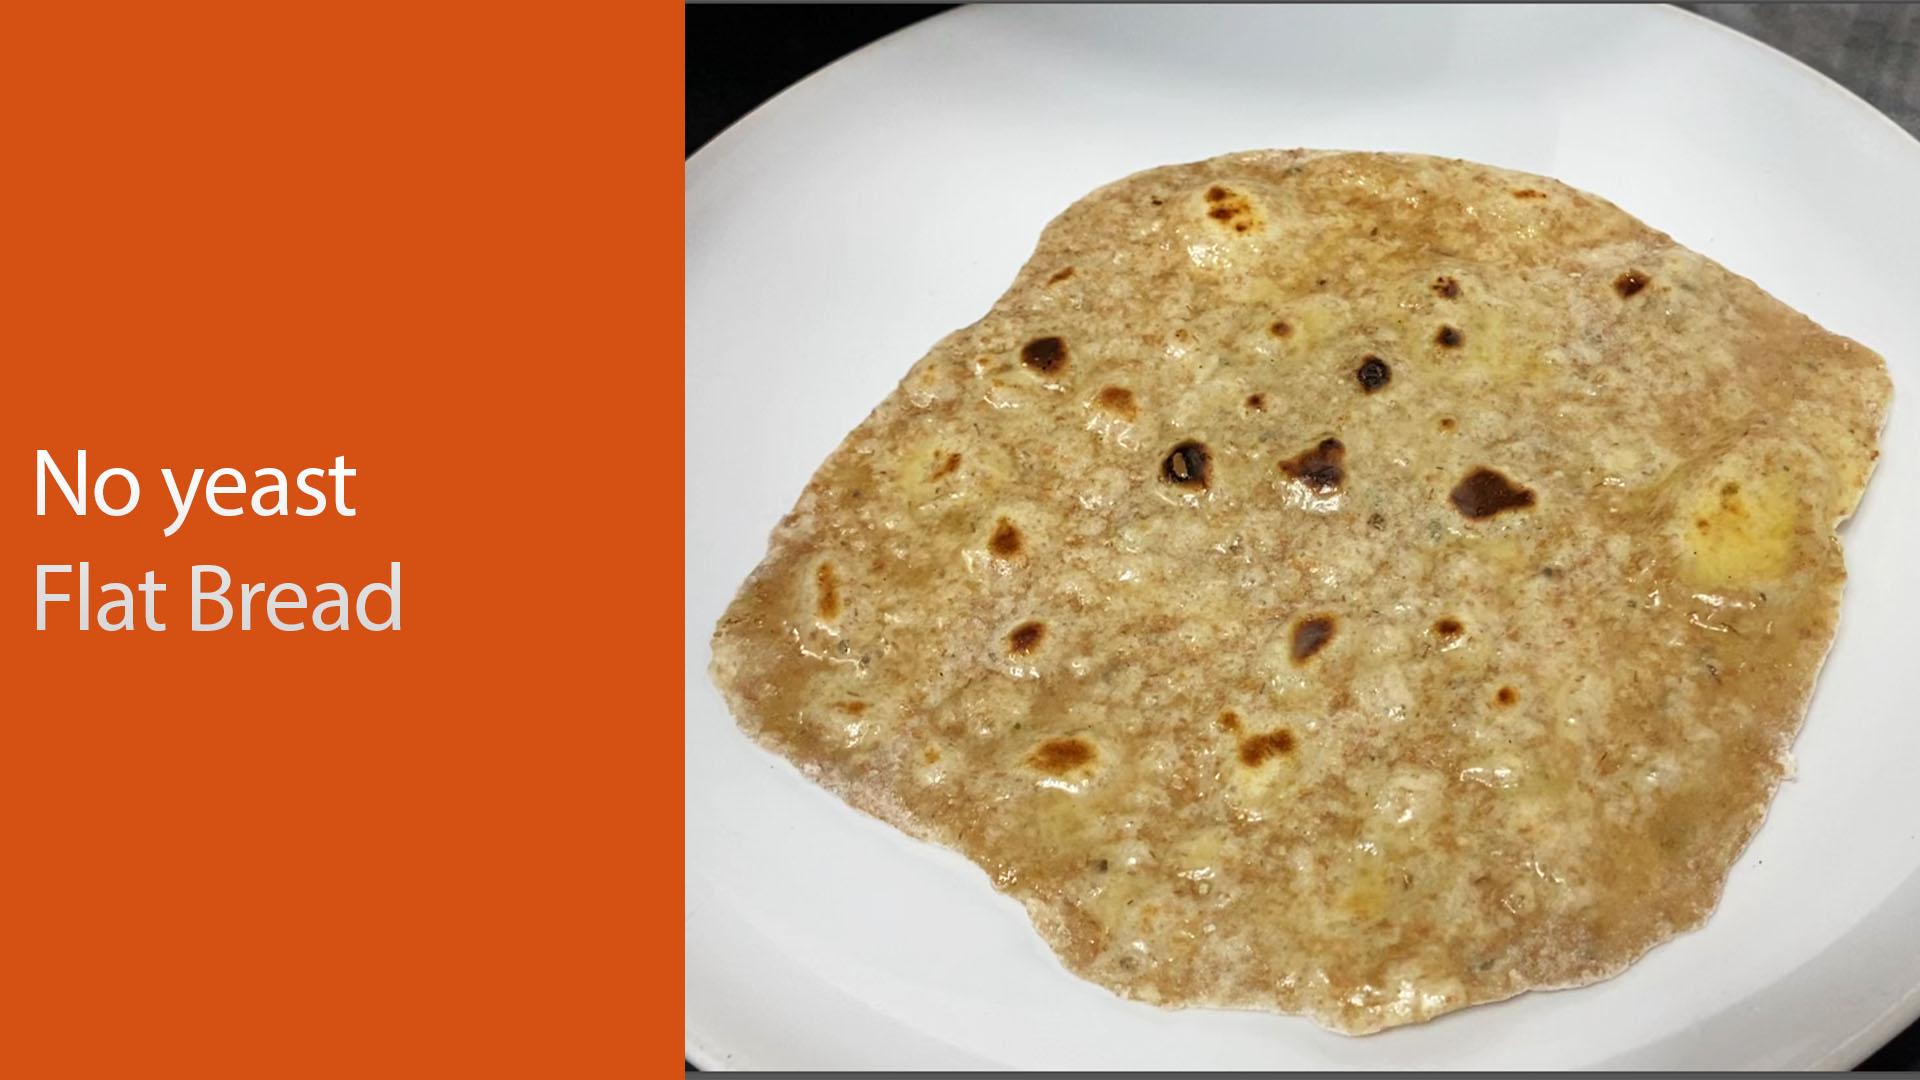 No yeast no dairy flat bread